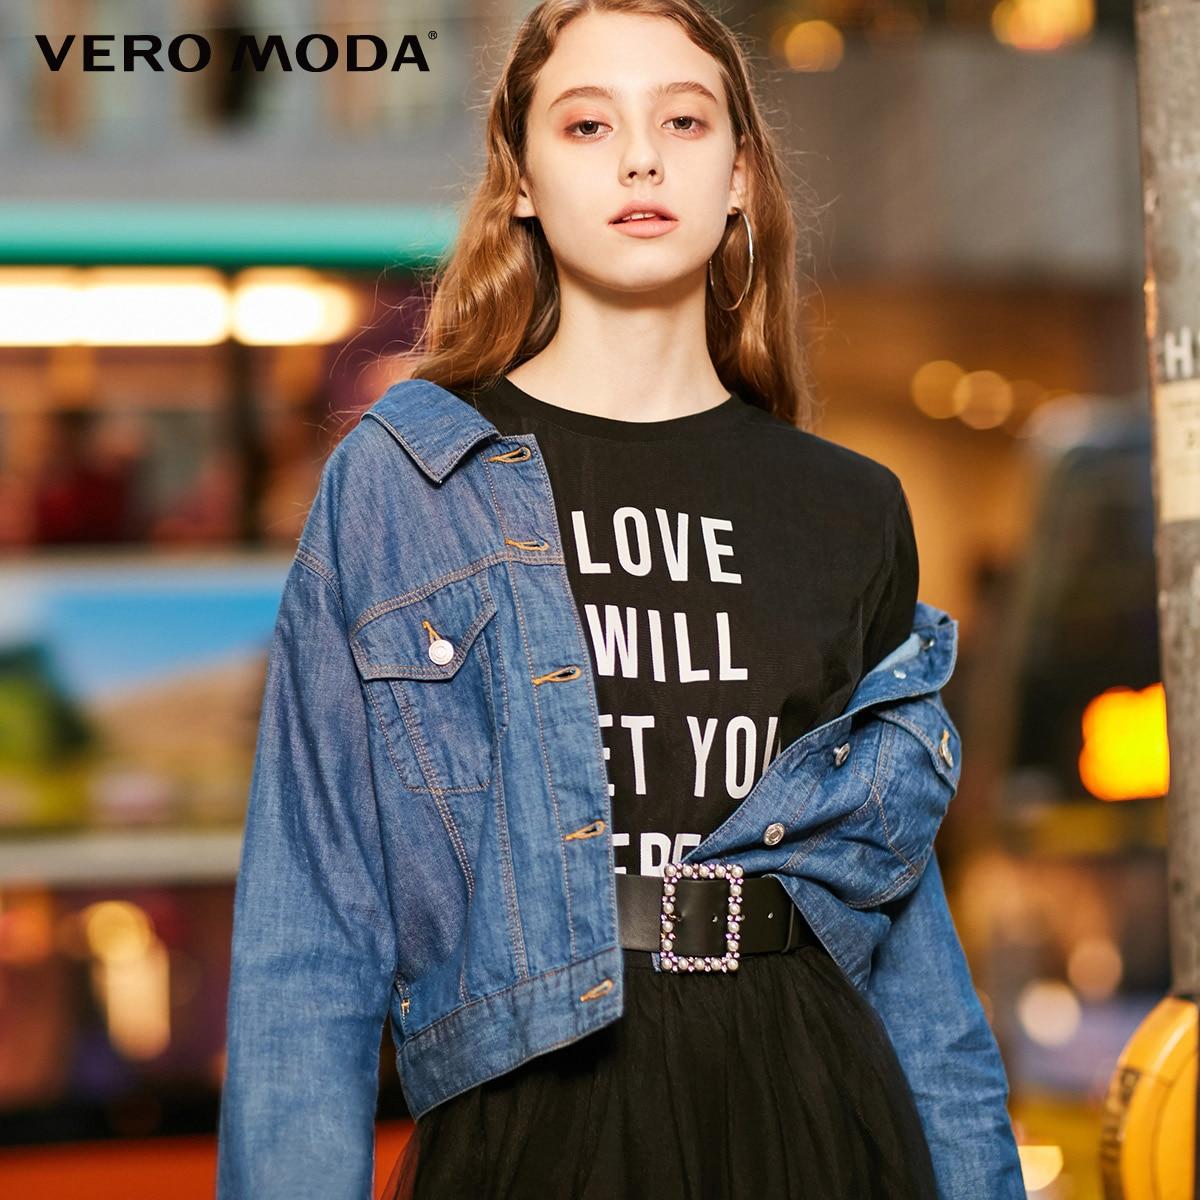 Vero Moda New Arrivals Women's Lace-up Short Denim Jacket  | 319157516